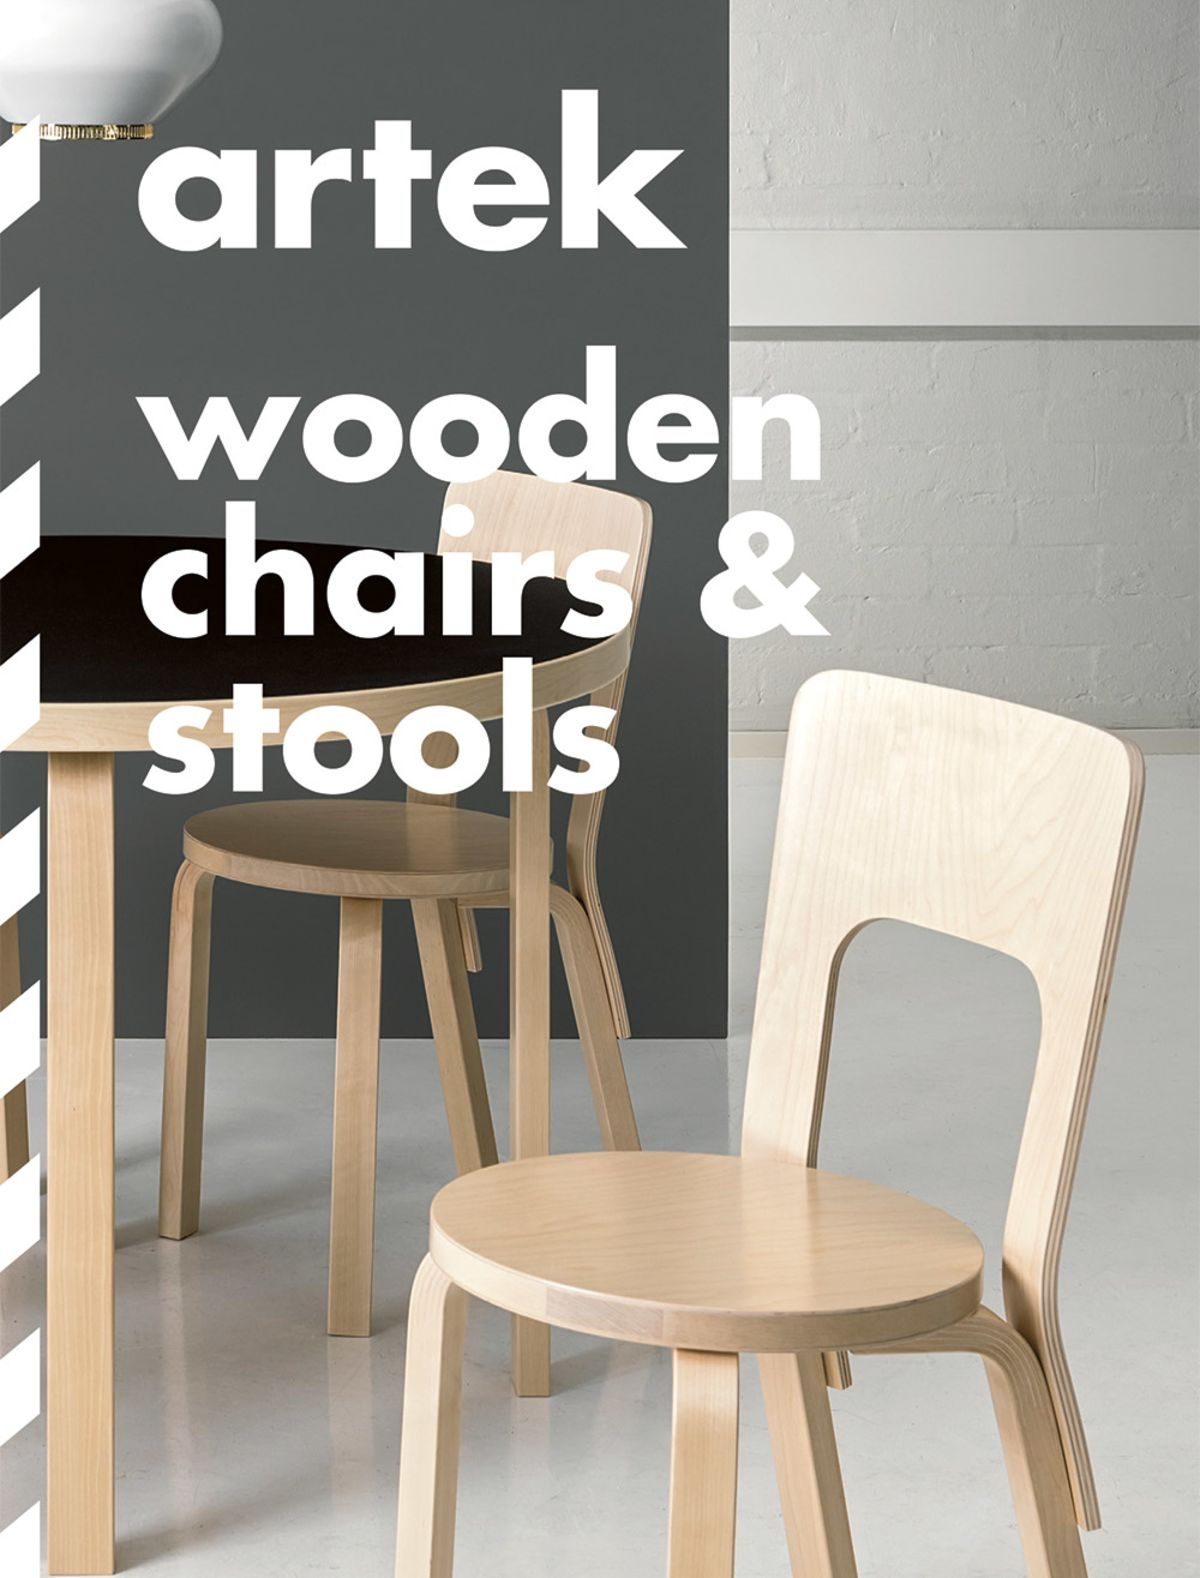 Artek_Wooden_Chairs_Stools_Preview